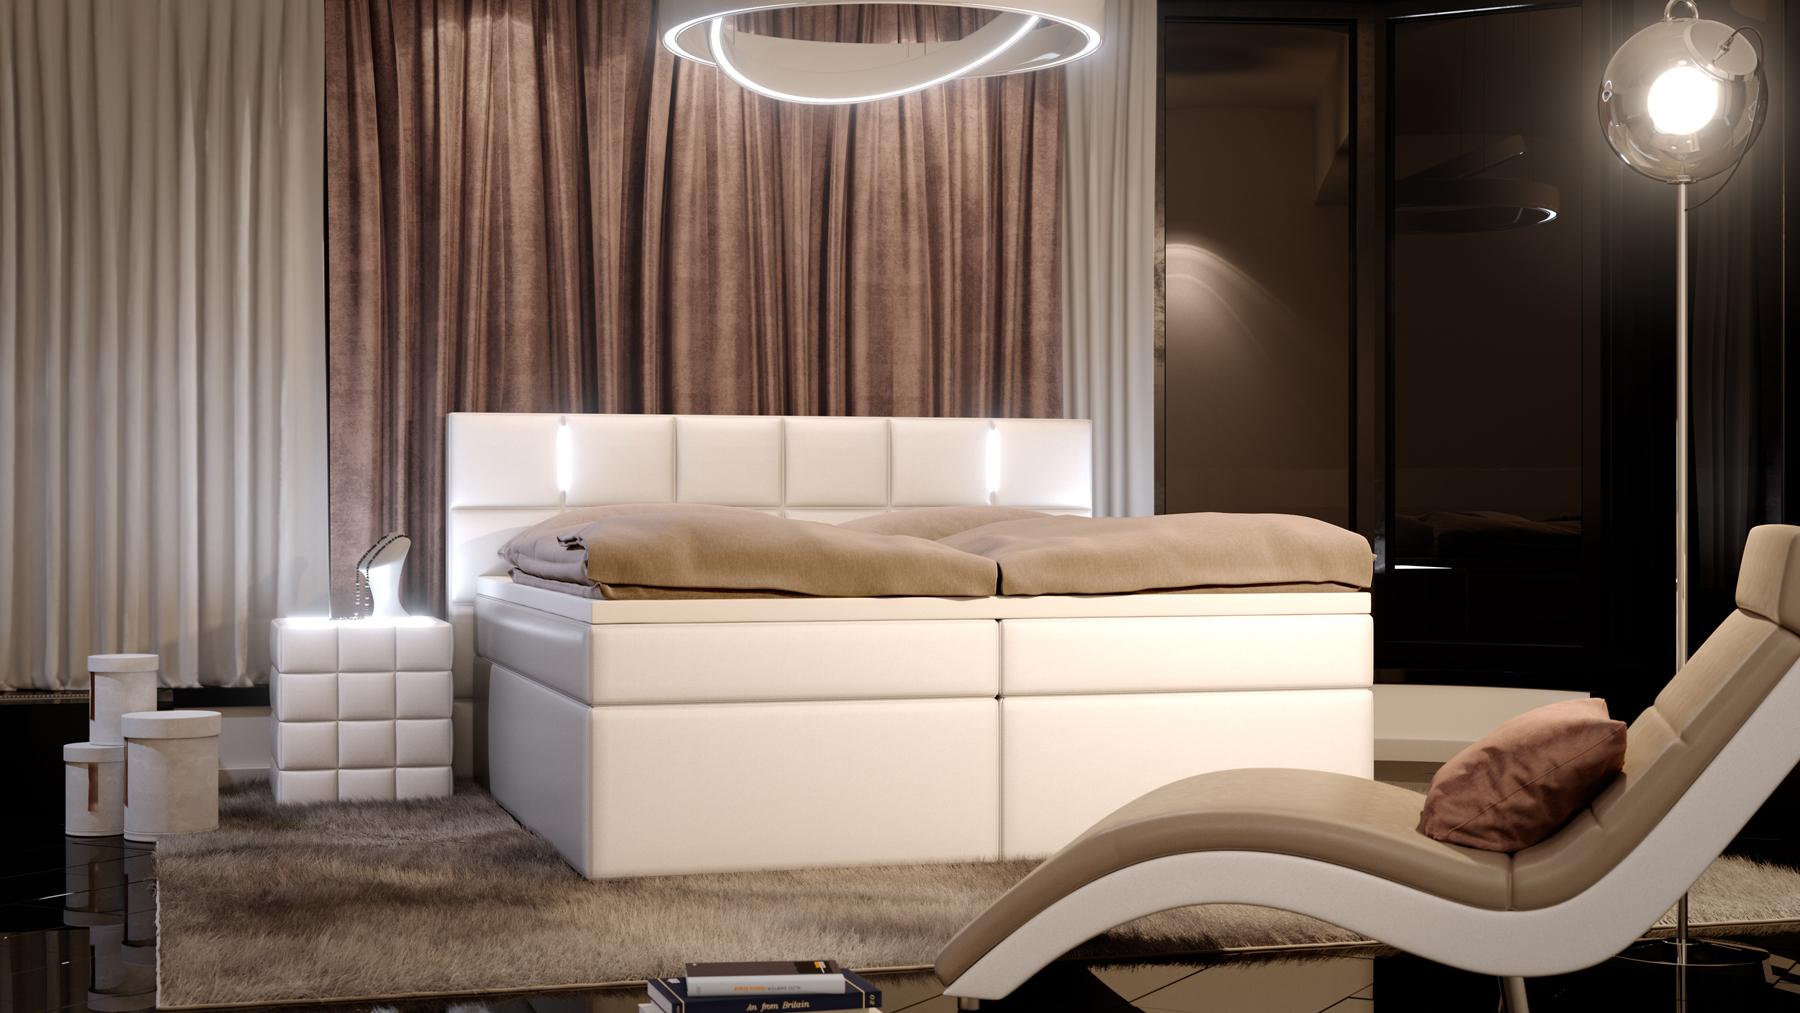 sam boxspringbett mit led hotelbett 180 x 200 cm wei salerno demn chst. Black Bedroom Furniture Sets. Home Design Ideas